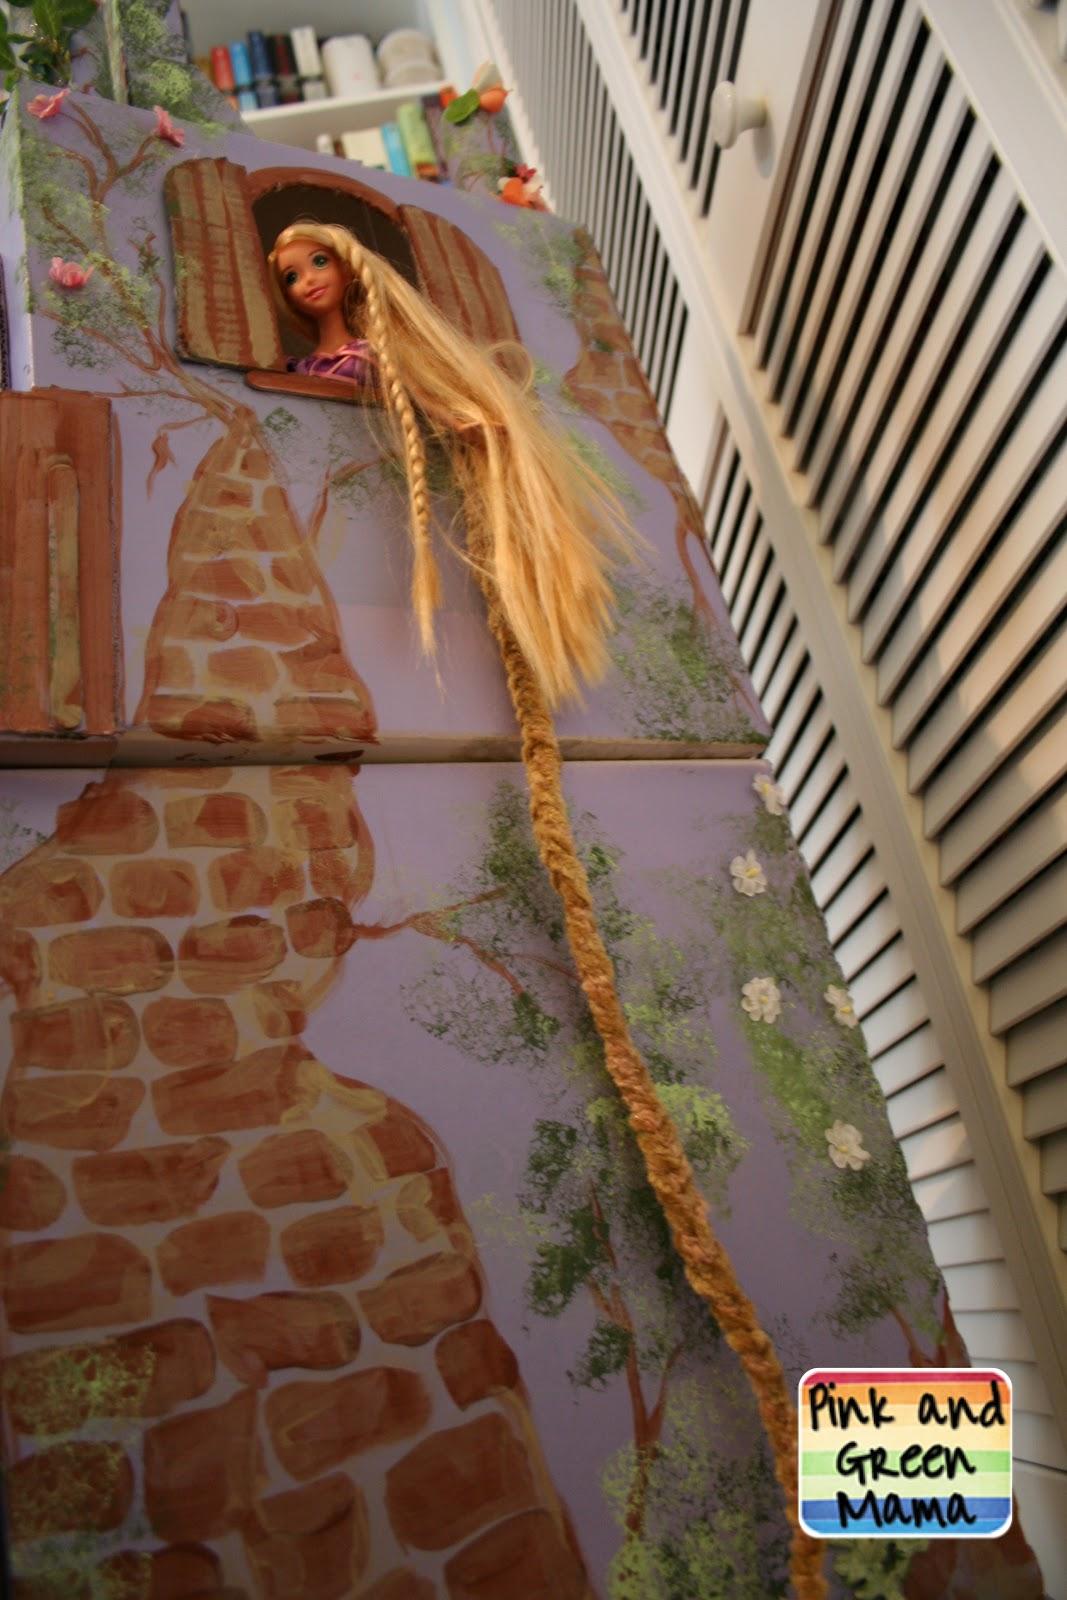 Pink and Green Mama  Cardboard Rapunzel Castle Homemade